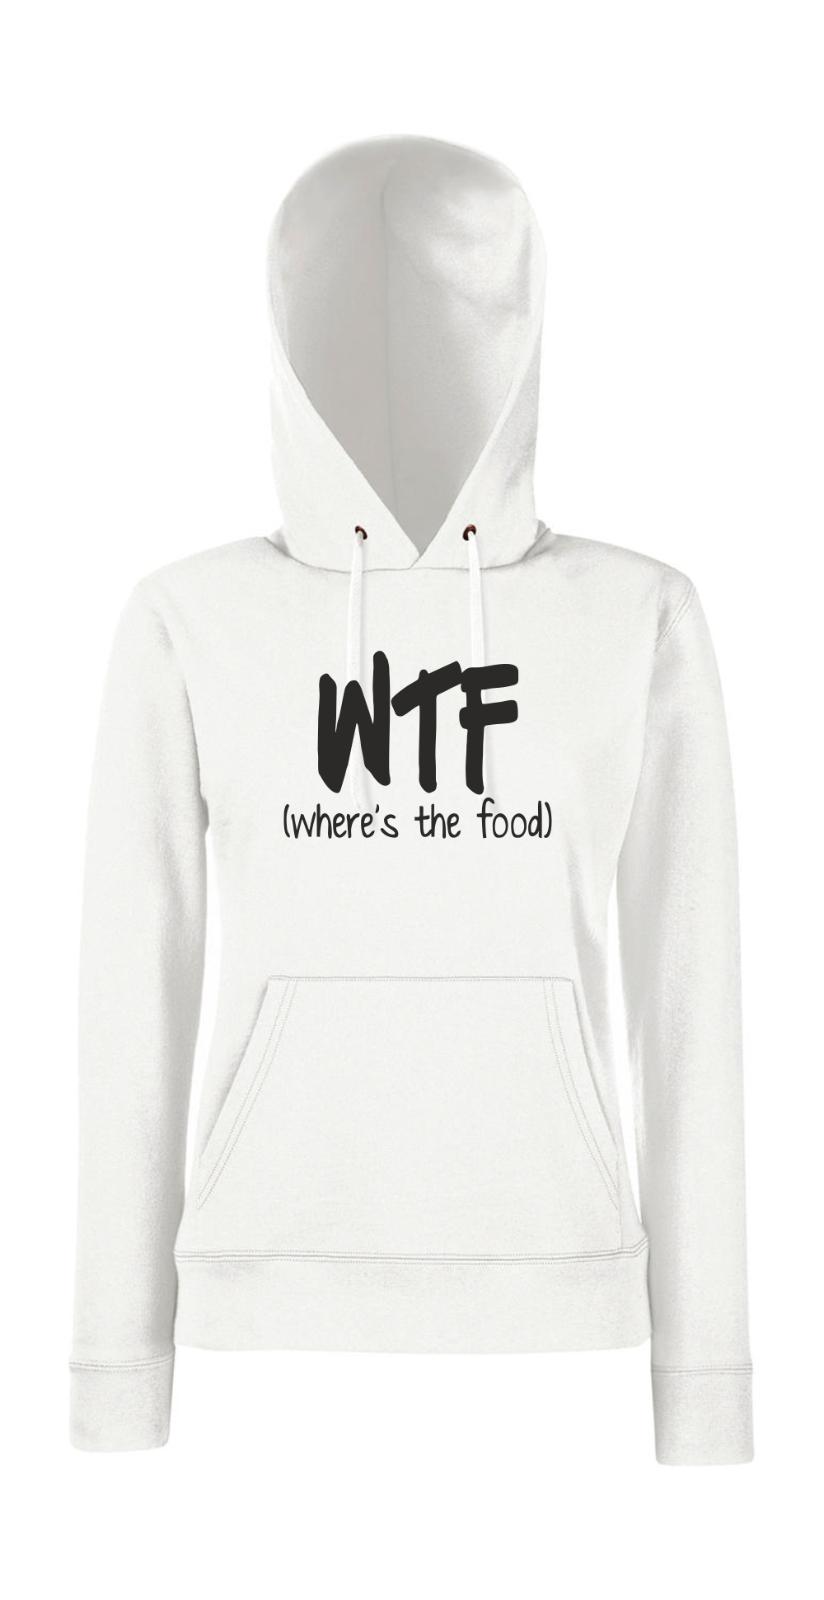 Wtf i Fun i i i Digreenido i Eslogans Femenino Jersey Capucha 2b5d88